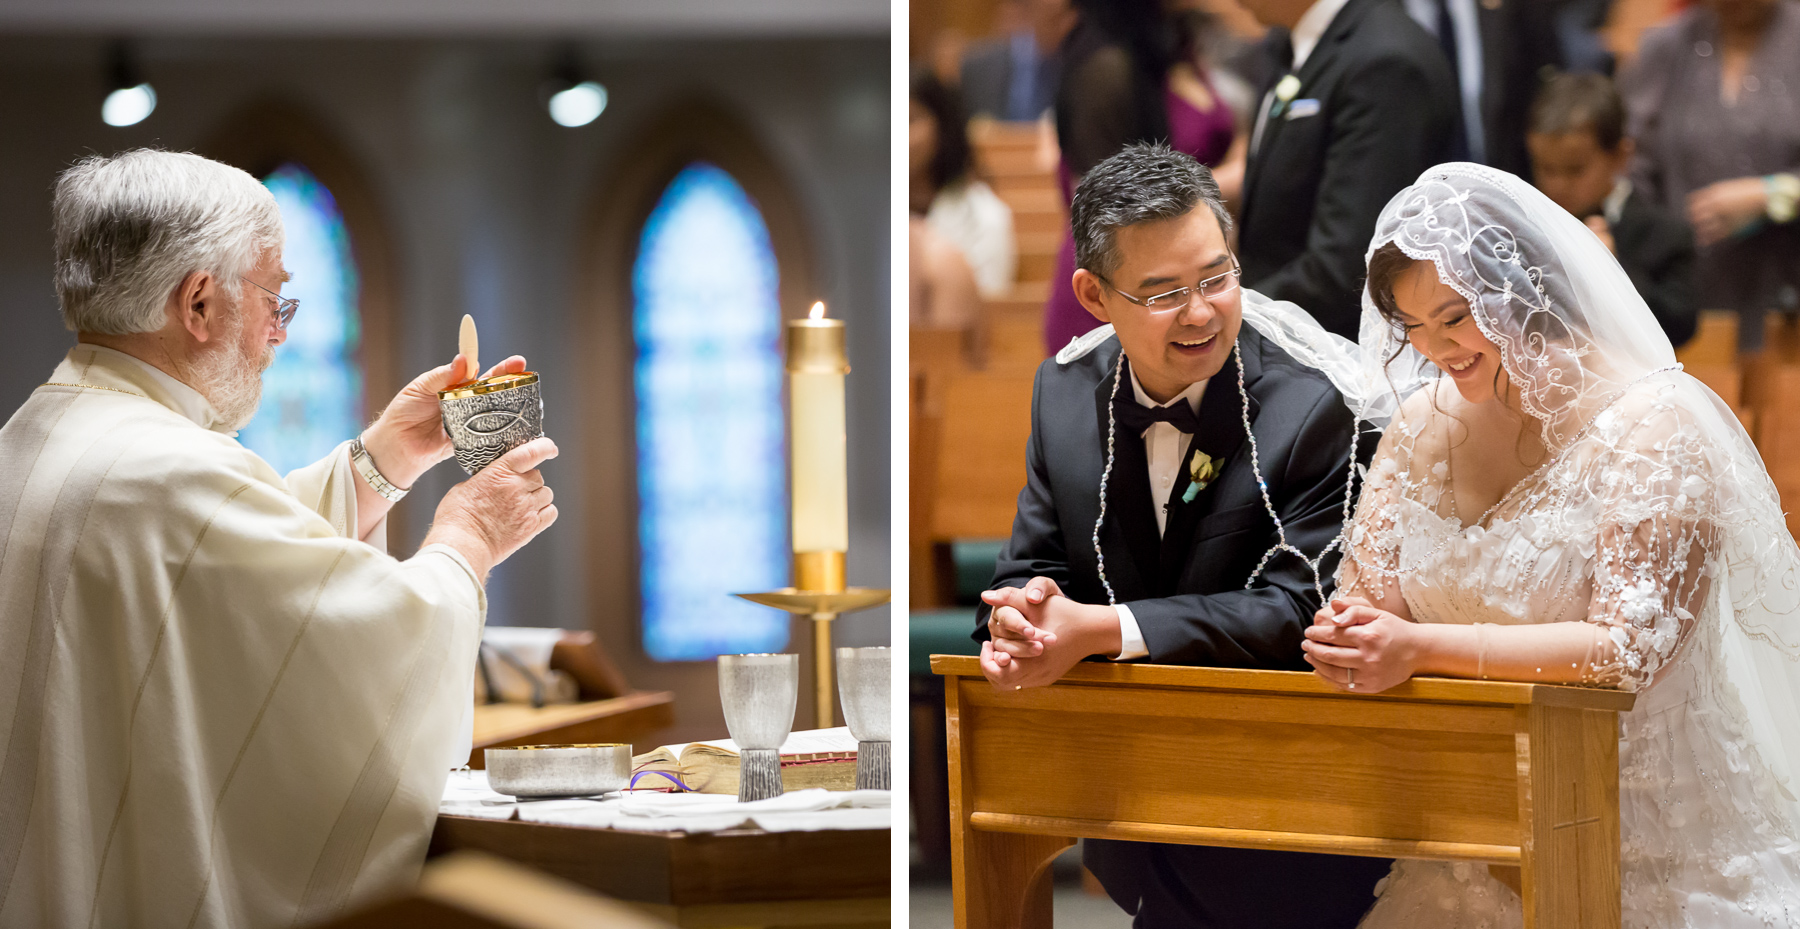 filipino-wedding-traditions-san-antonio.jpg